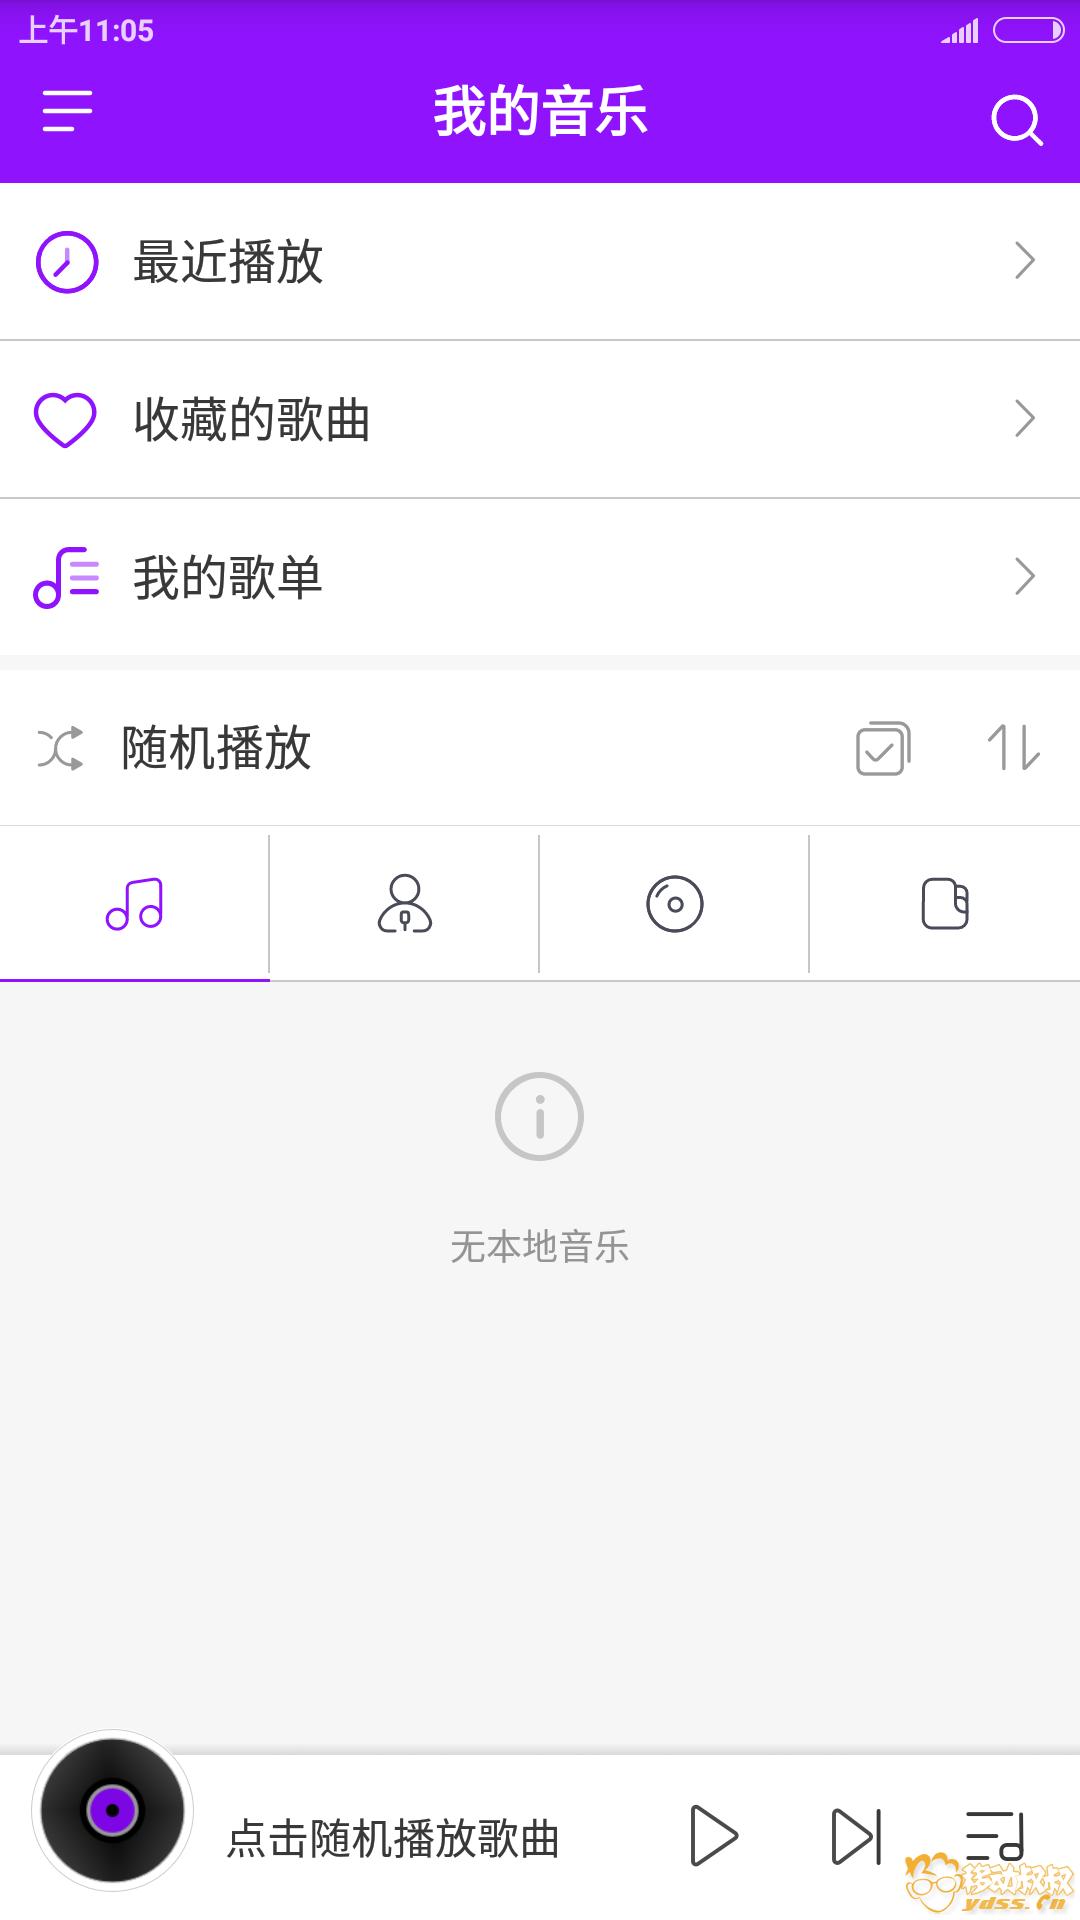 Screenshot_2018-01-28-11-05-10-434_com.miui.player.png